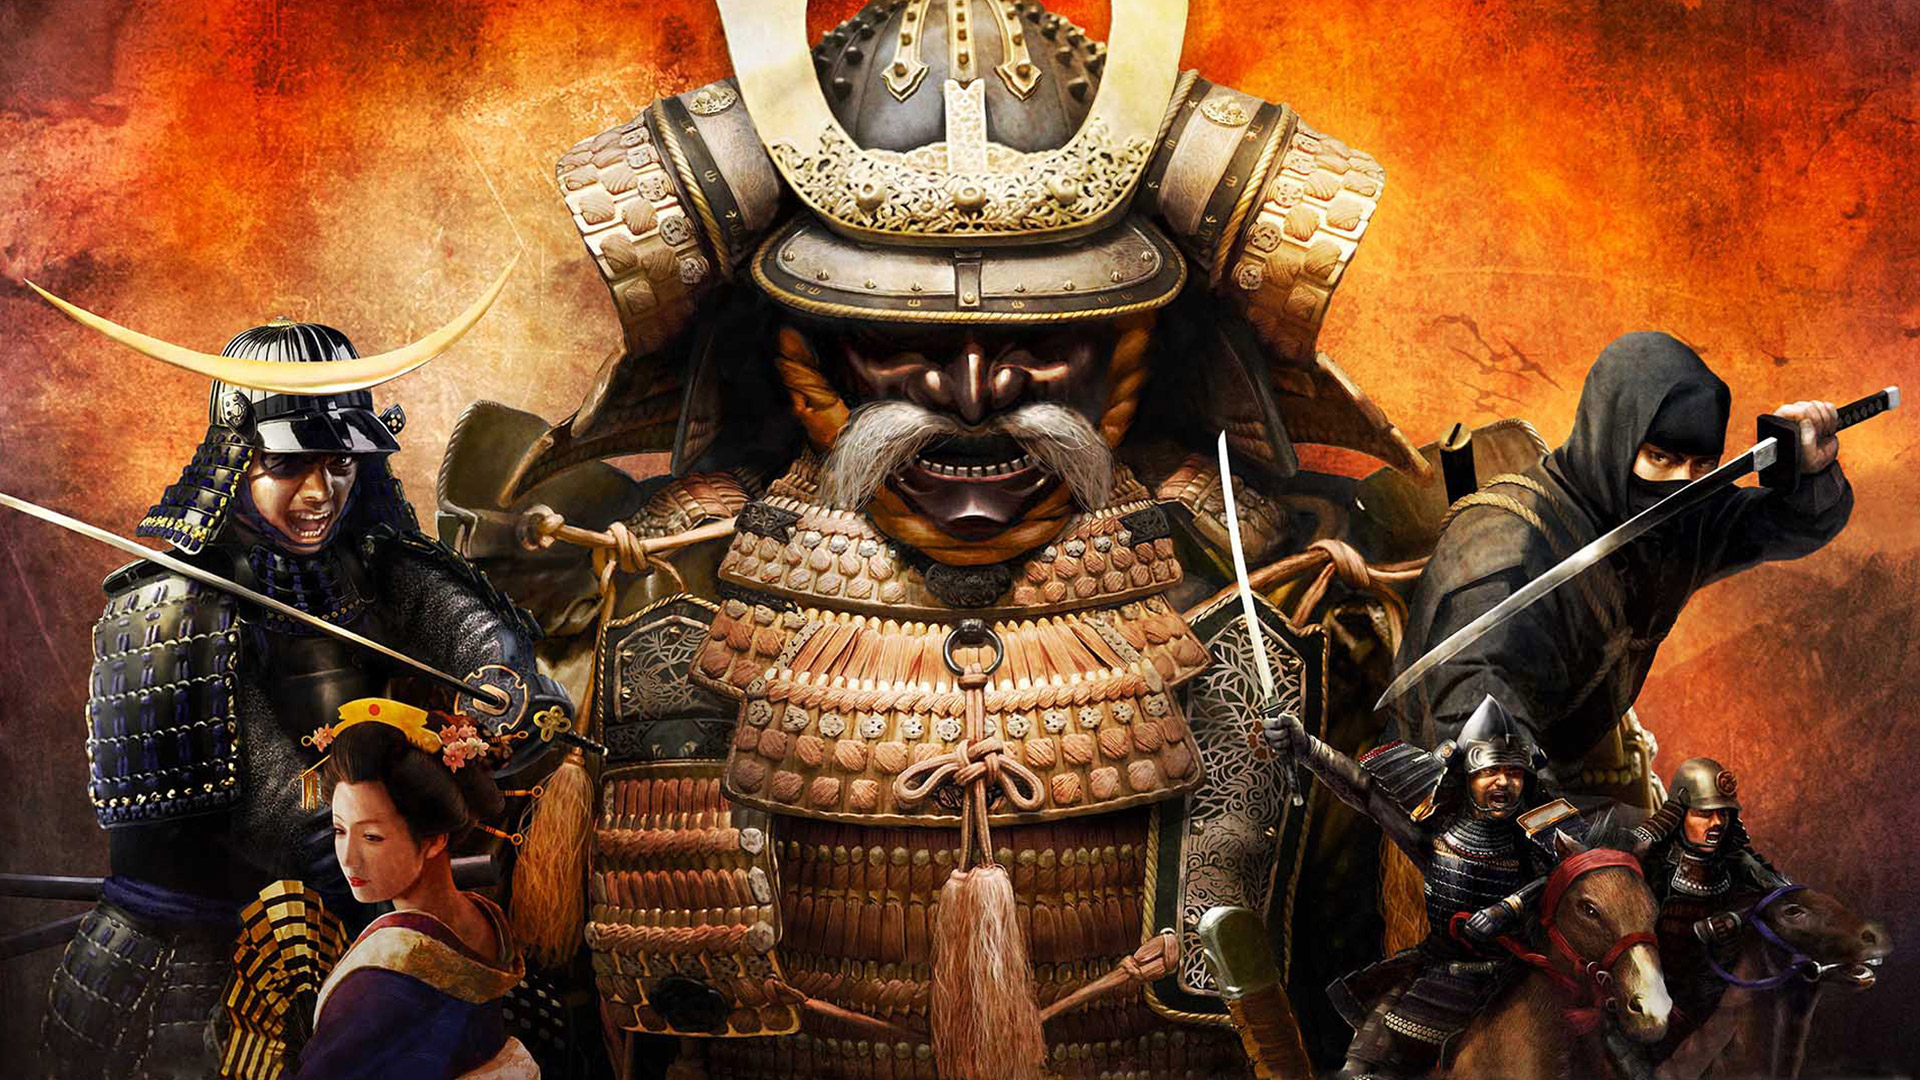 Free Total War: Shogun 2 Wallpaper in 1920x1080